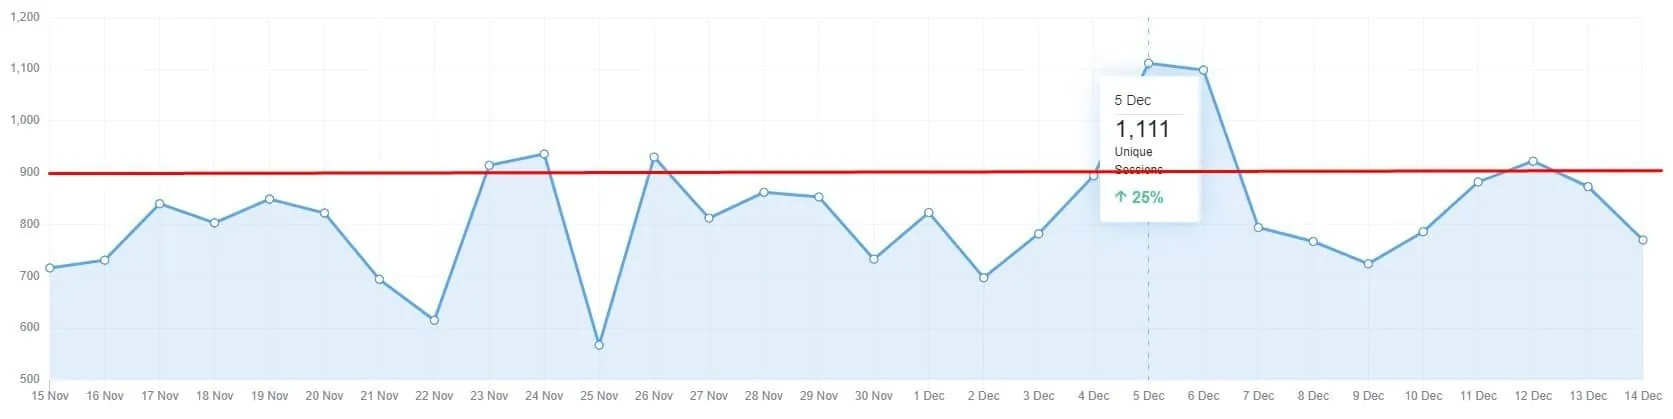 How to Build High SEO Ranking WordPress Site